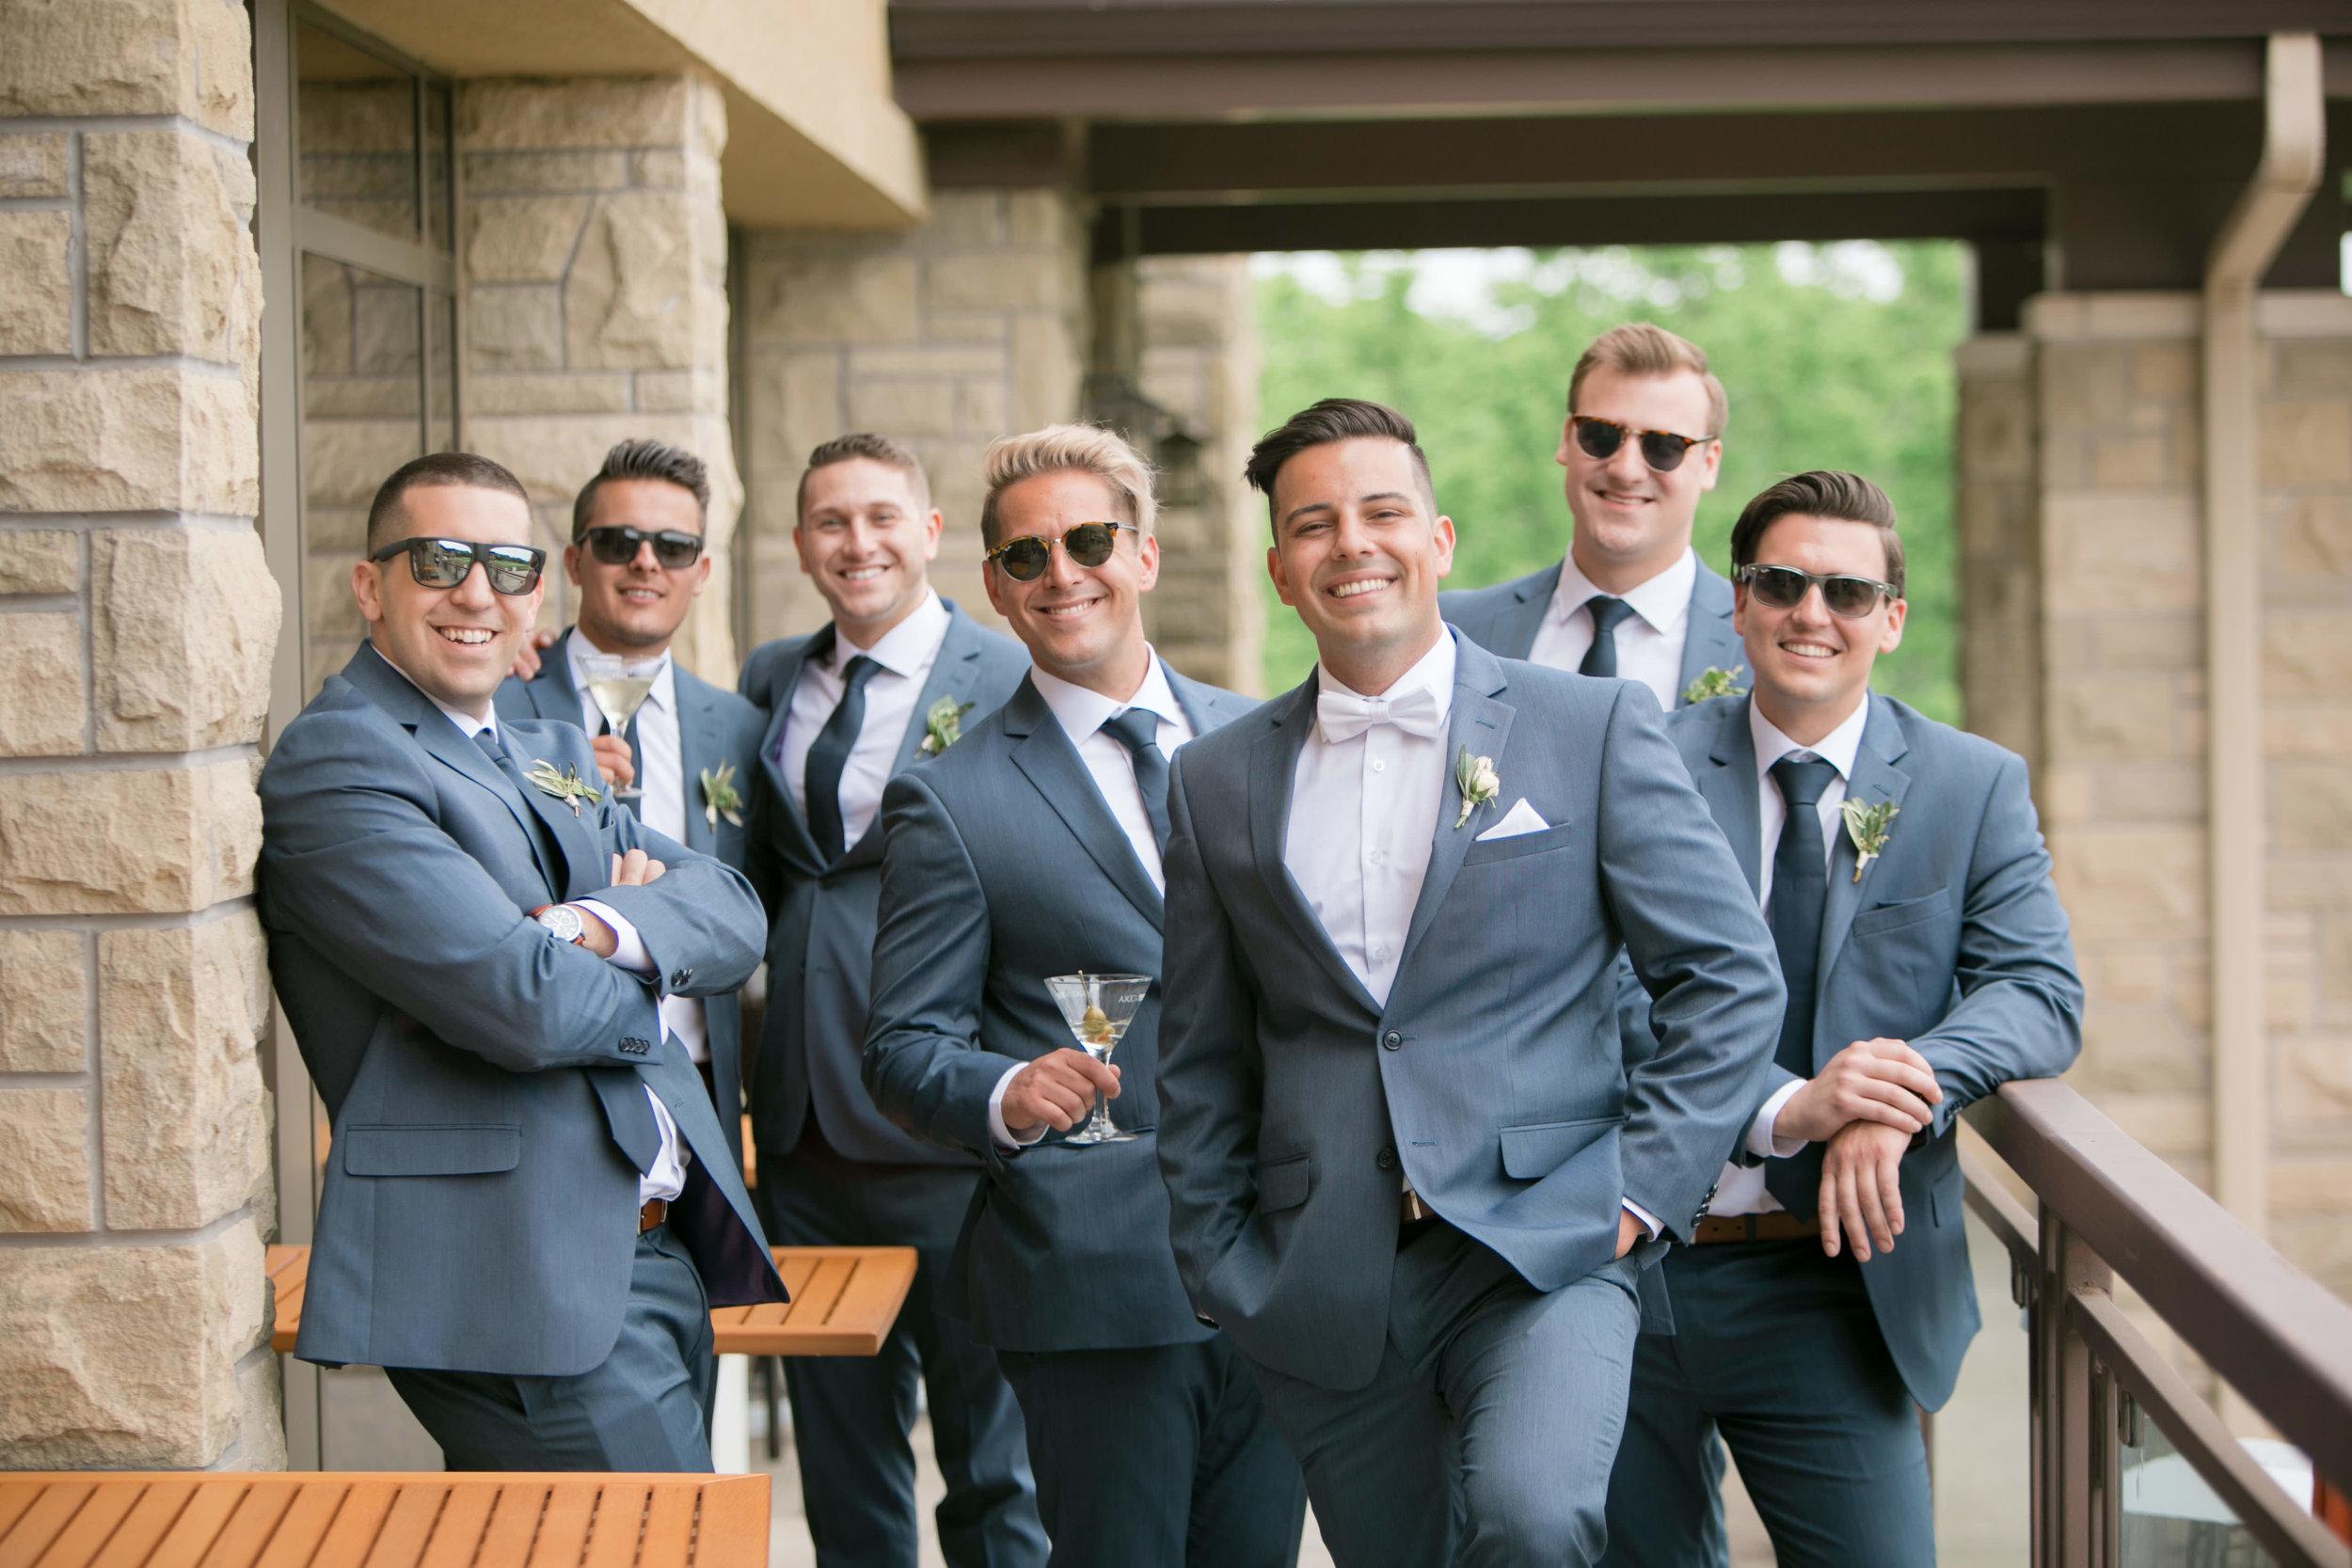 Miranda___Daniel___Daniel_Ricci_Weddings___High_Res._Finals_378.jpg